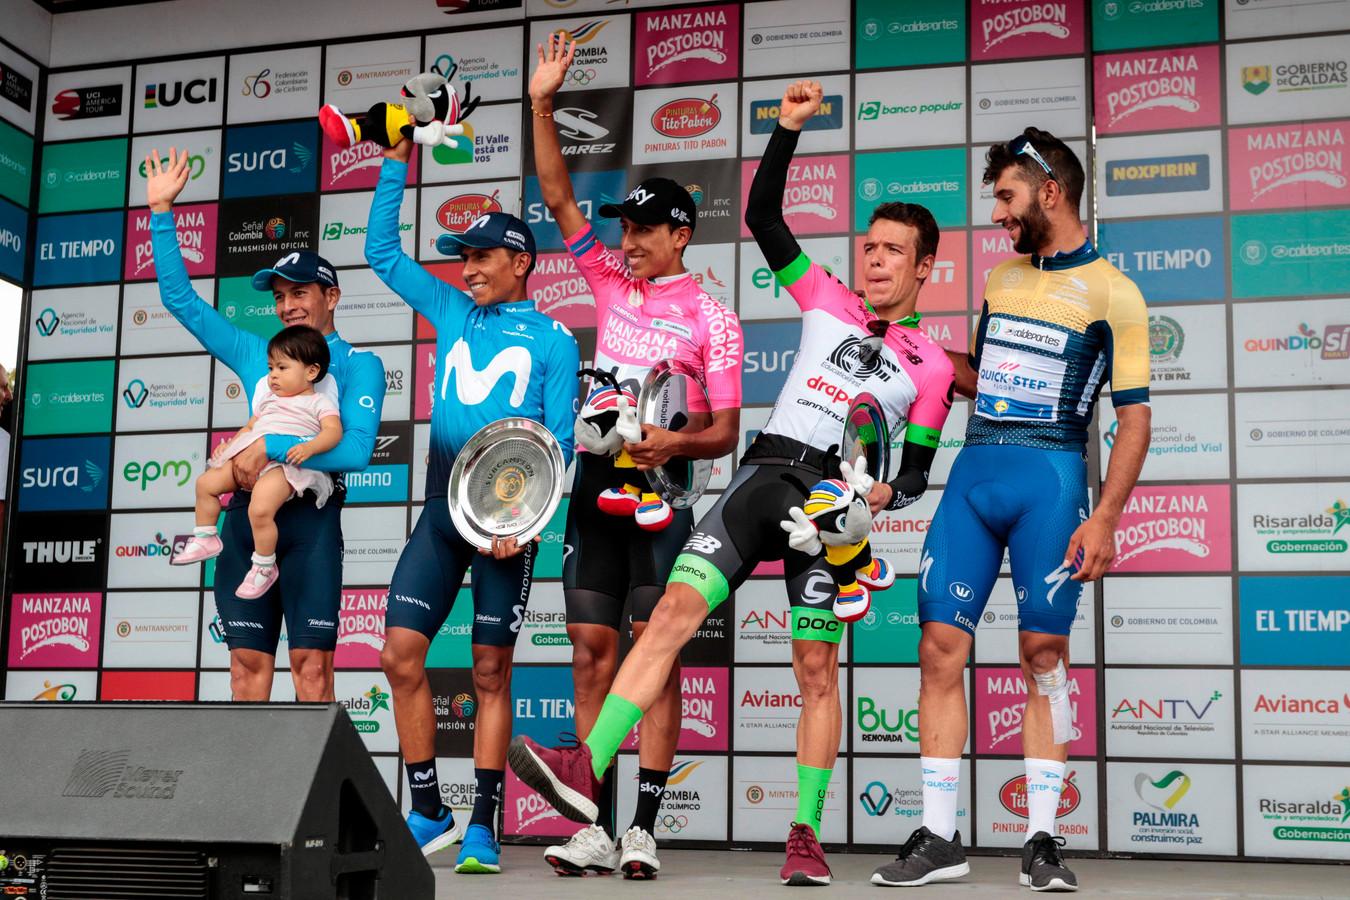 Colombiaanse renners (v.l.n.r.) vorig jaar: Dayer Quintana, Nairo Quintana (Movistar Team), eindwinnaar Bernal (Team Sky), Urán (Education First Team) en Gaviria (Quick-Step Floors).